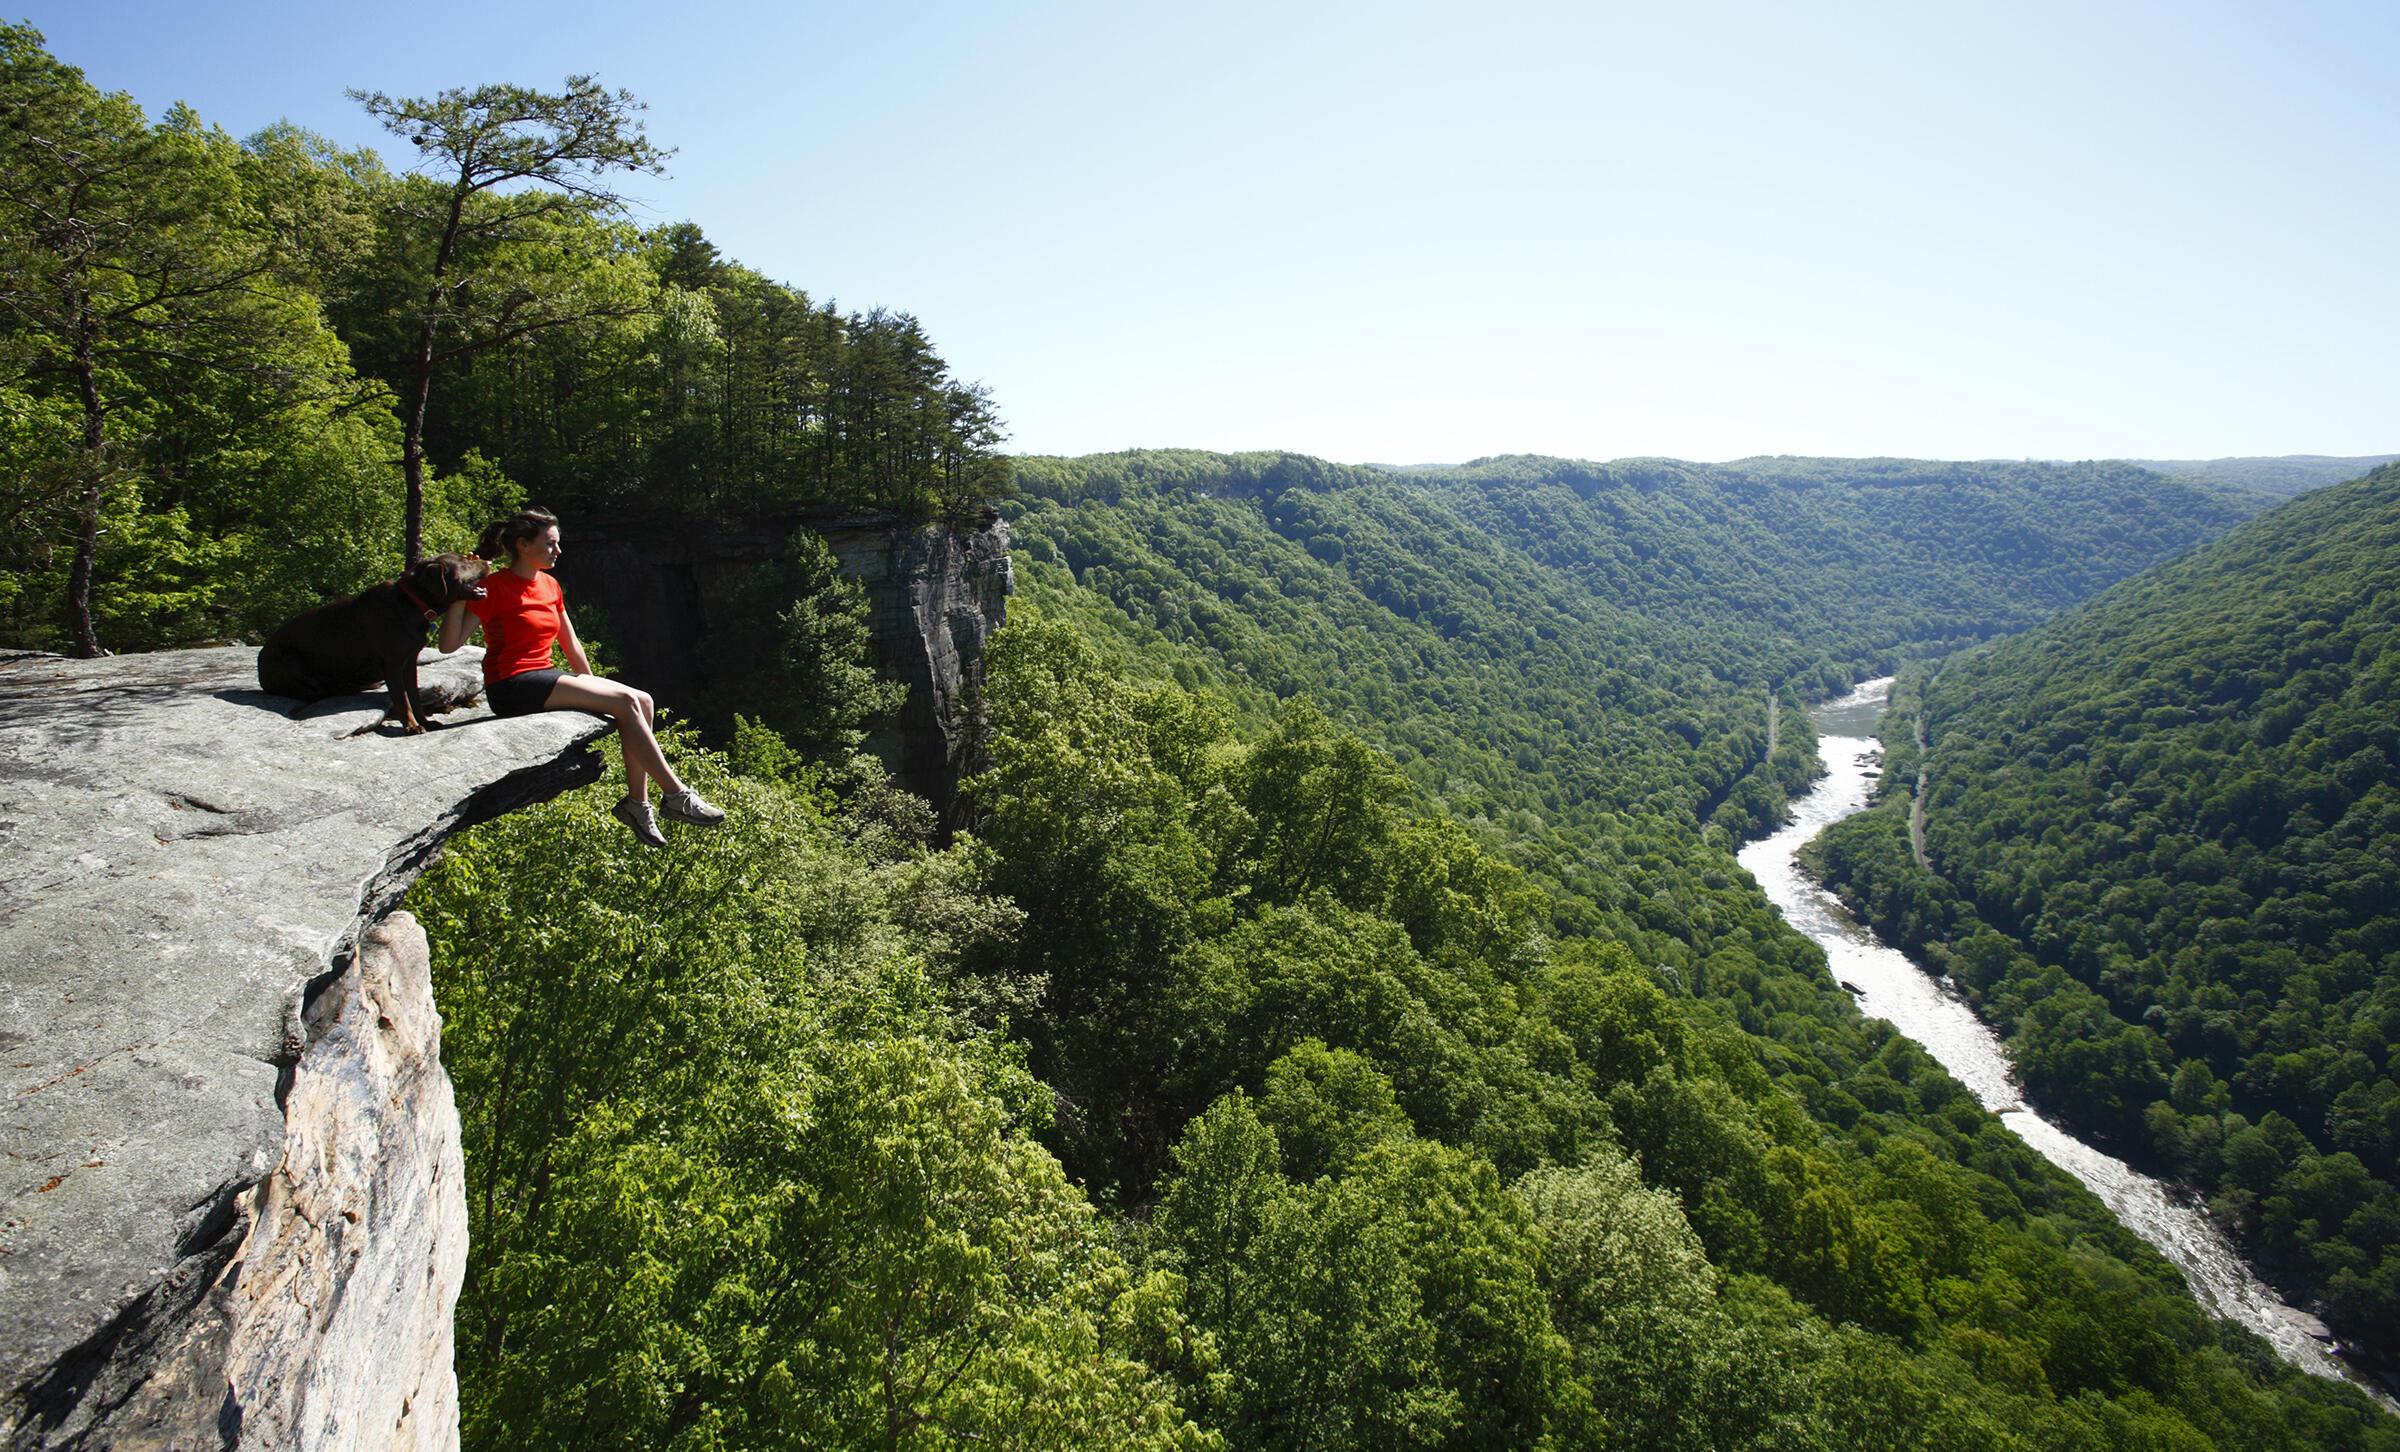 New River Gorge near Fayetteville West Virginia. Harrison Shull/Aurora Photos